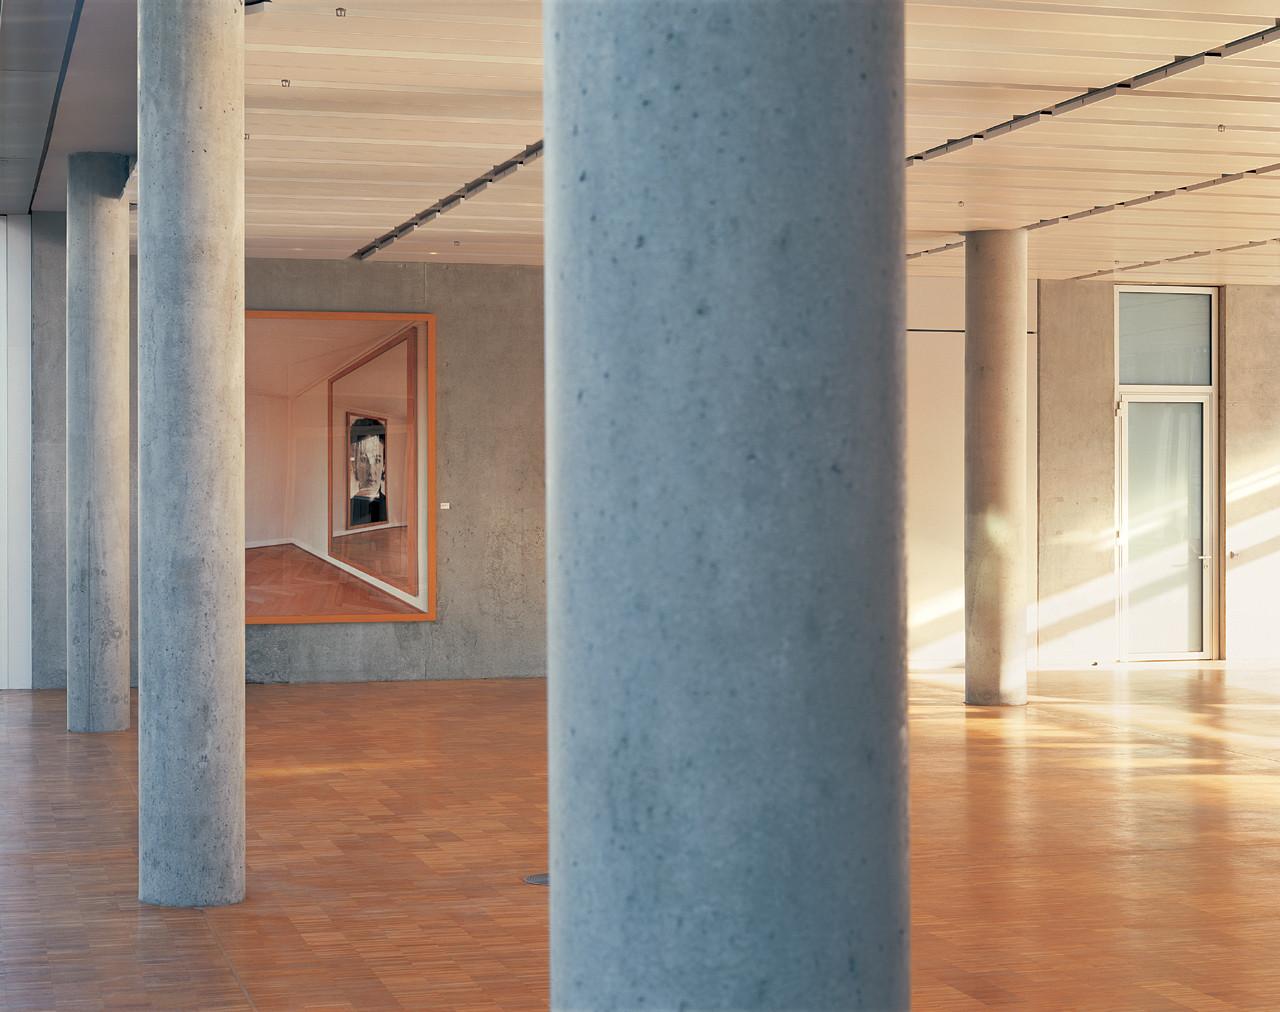 Porsche Dürr Stuttgart Ben Dieckmann architects